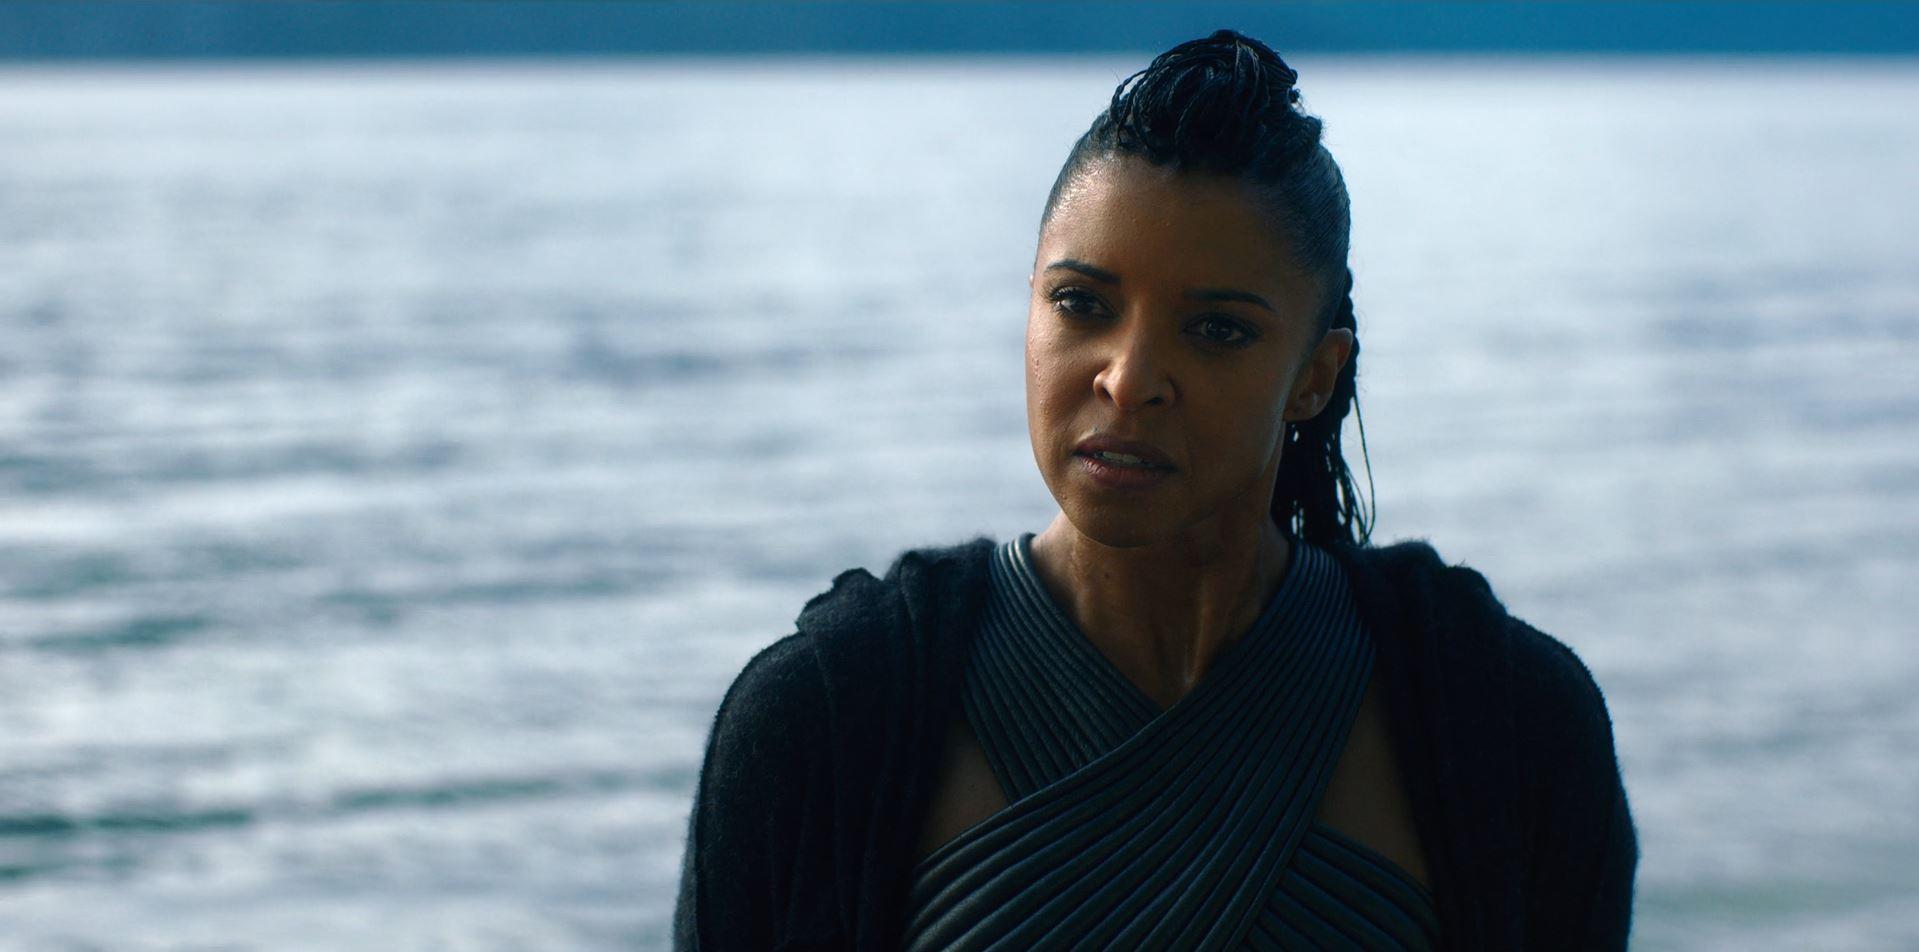 Altered Carbon Season 2 Review - Quellcrist Falconer played by Renée Elise Goldsberry